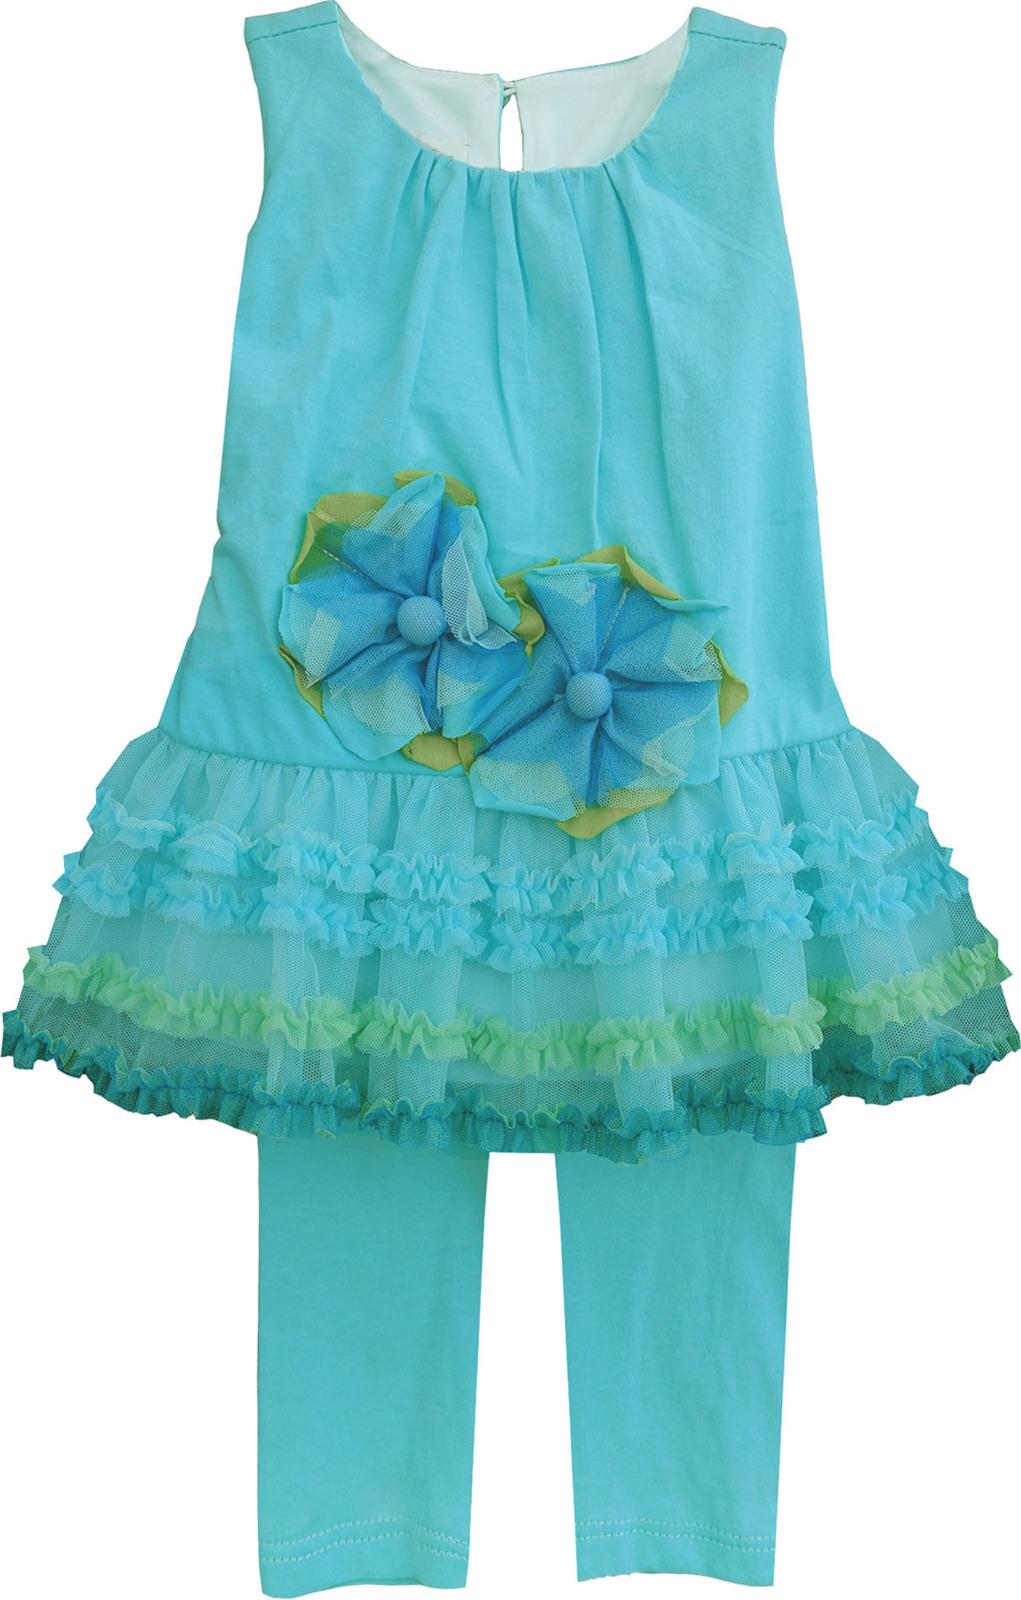 Isobella & Chloe - Little Girls NASHVILLE_Two Piece Pant Set